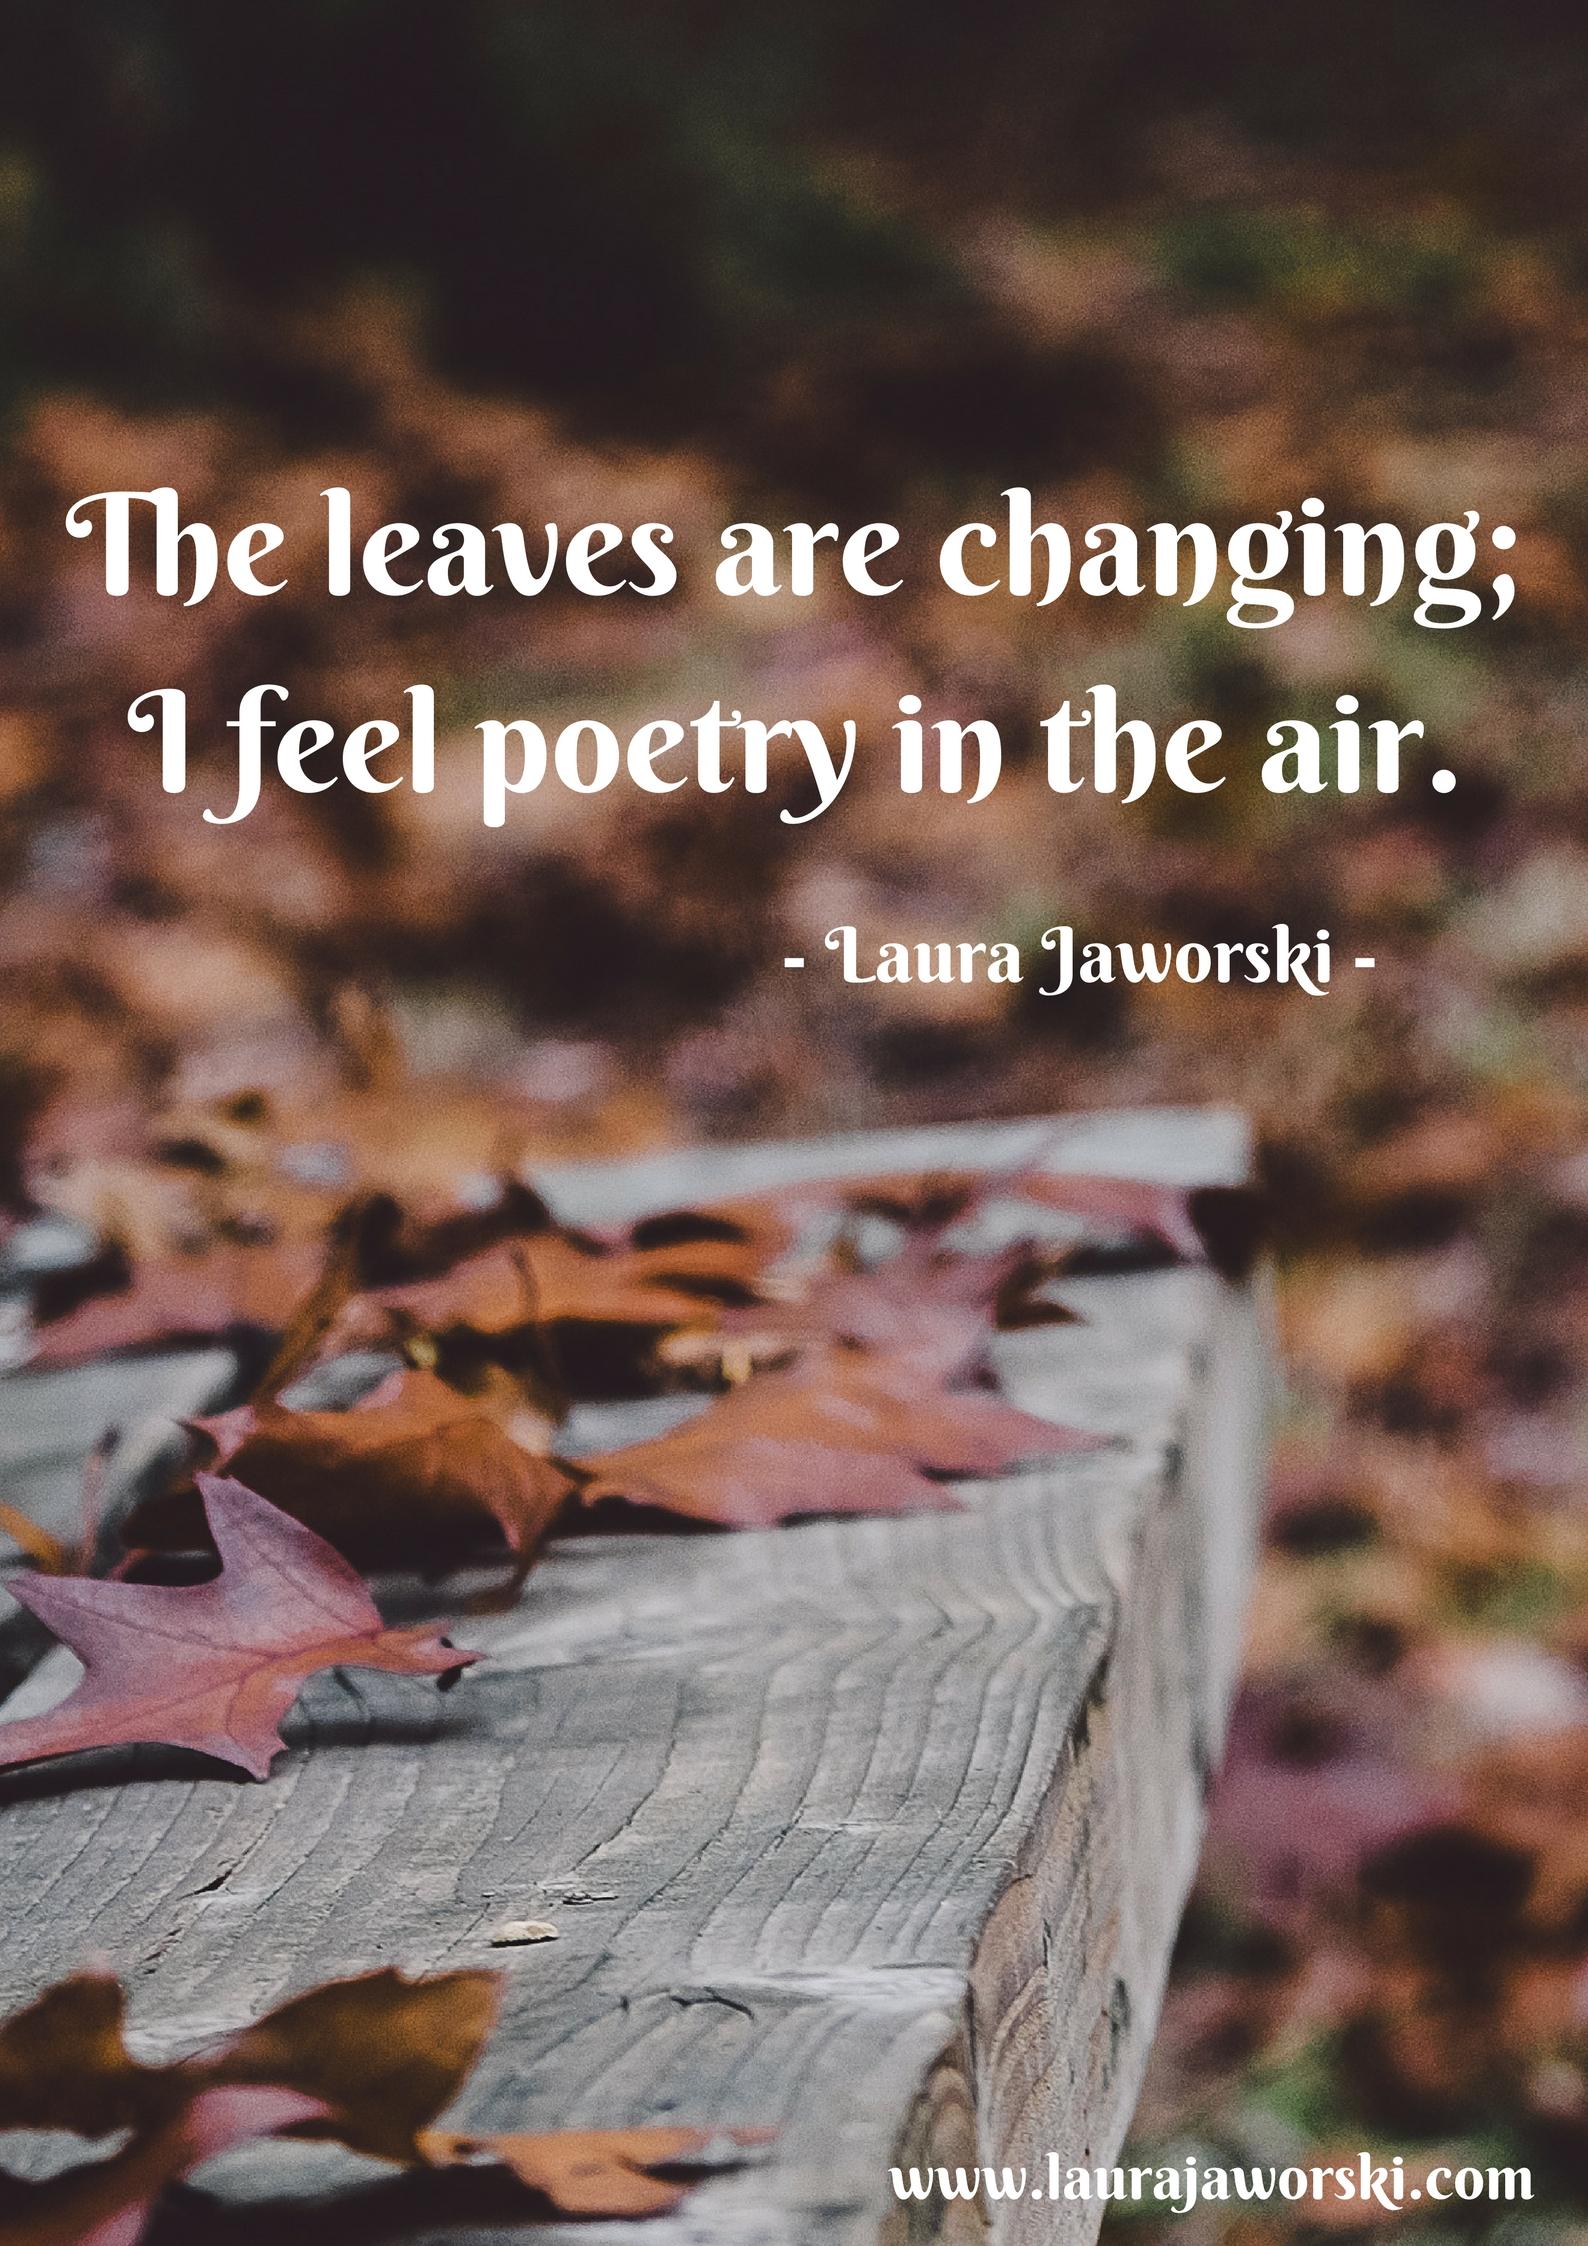 Autumn | www.laurajaworski.com